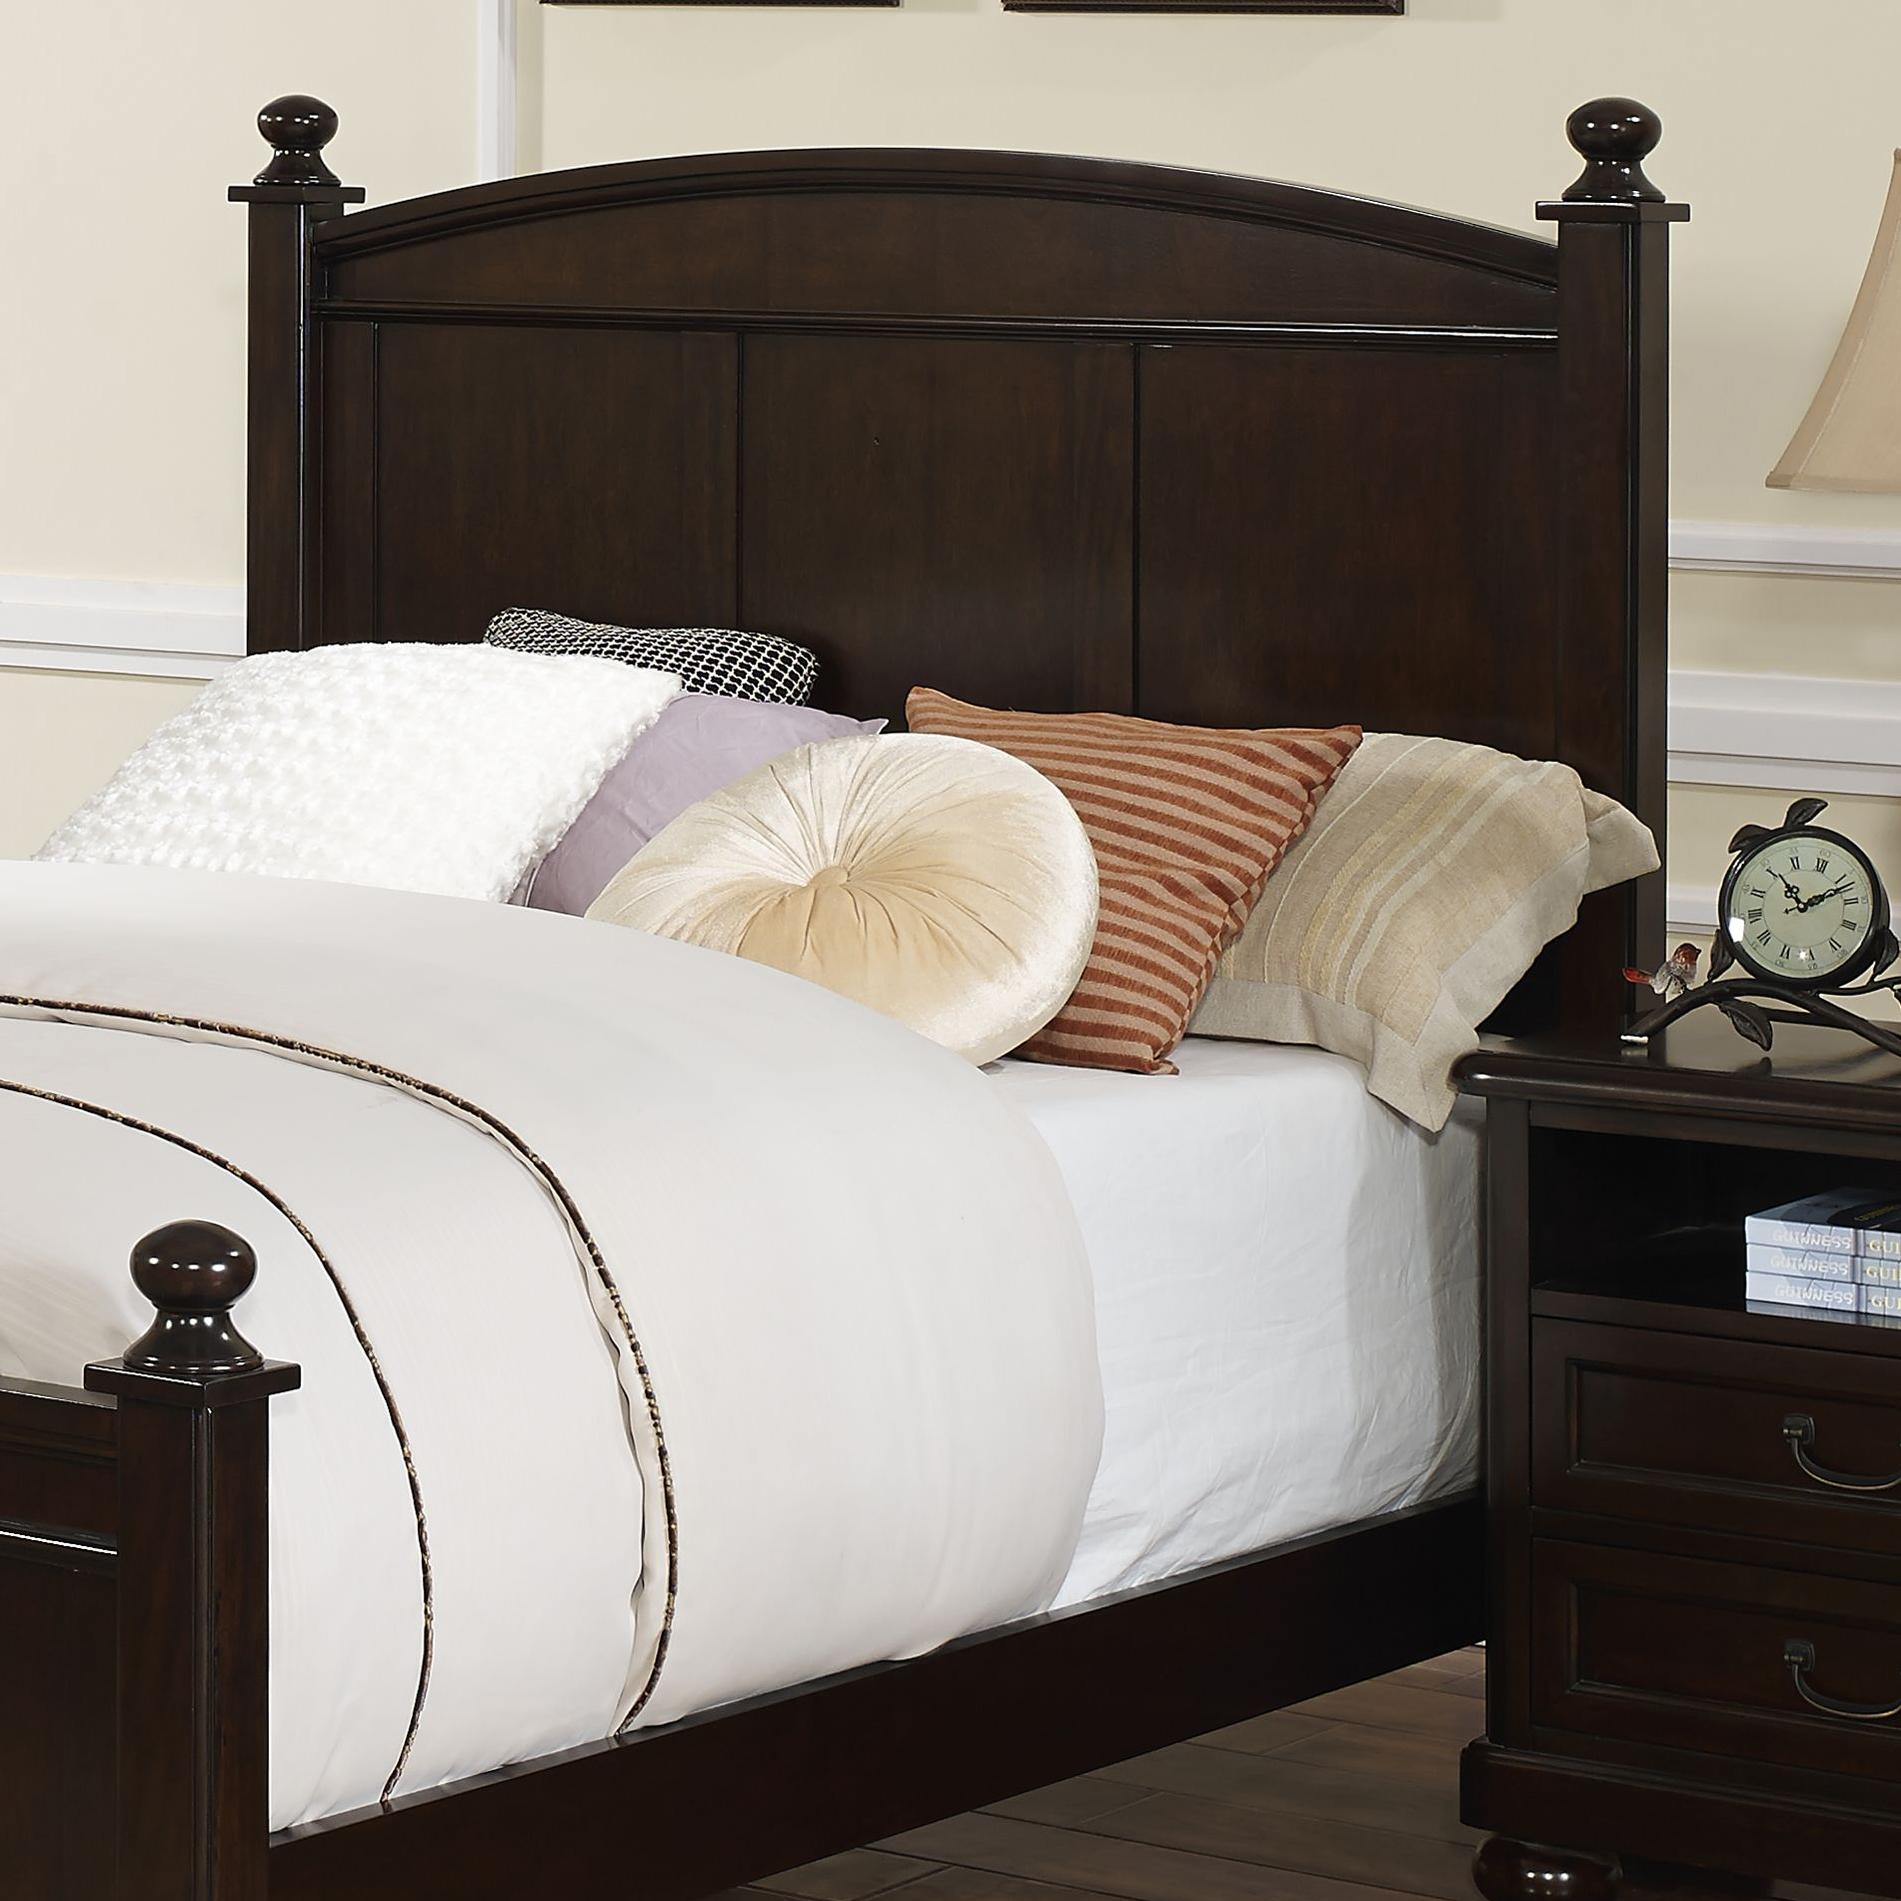 Full Panel Bed Headboard